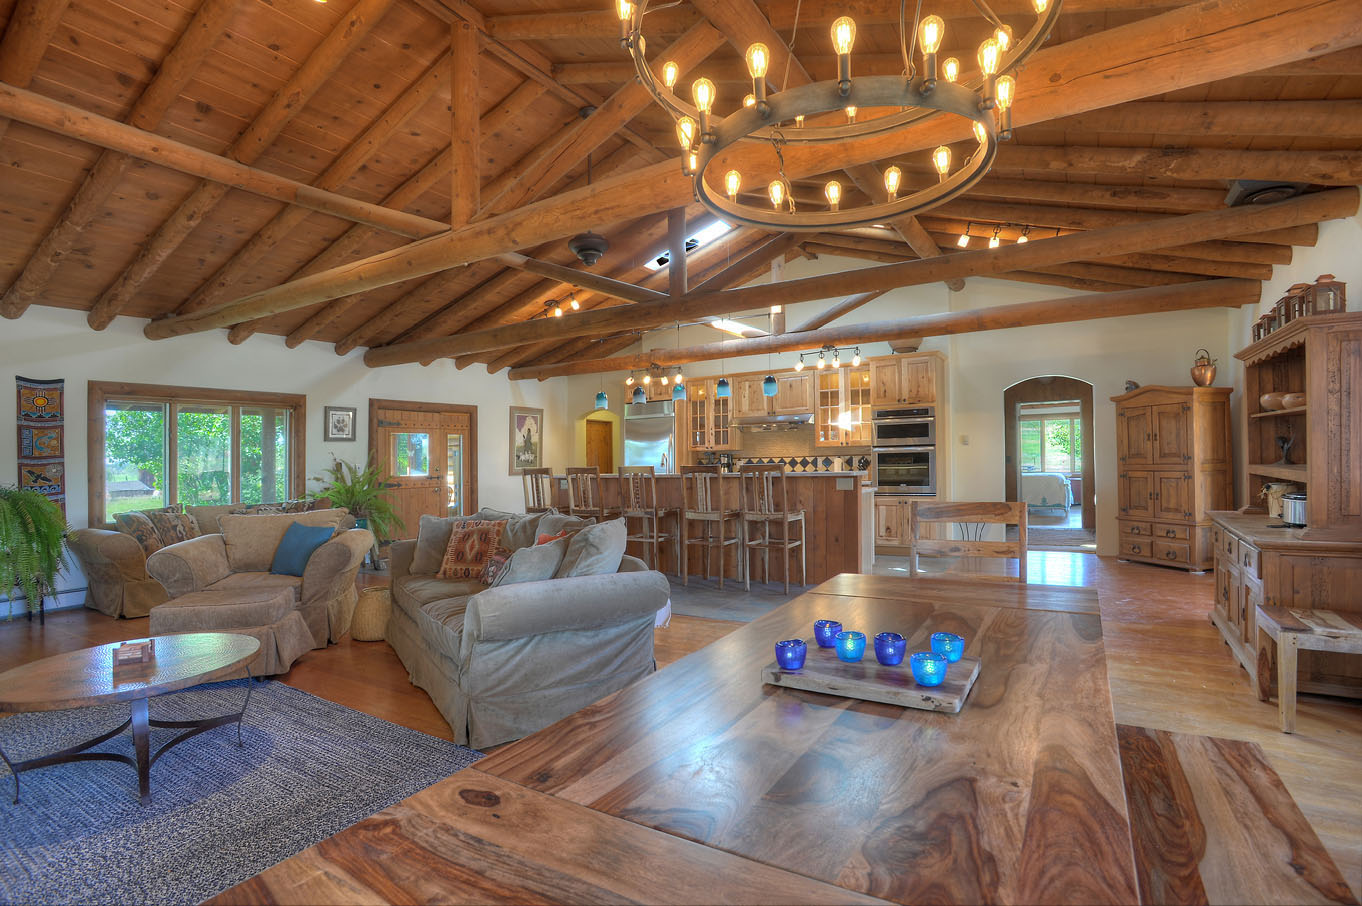 Vacation Accommodations of Durango - Vacation Rentals